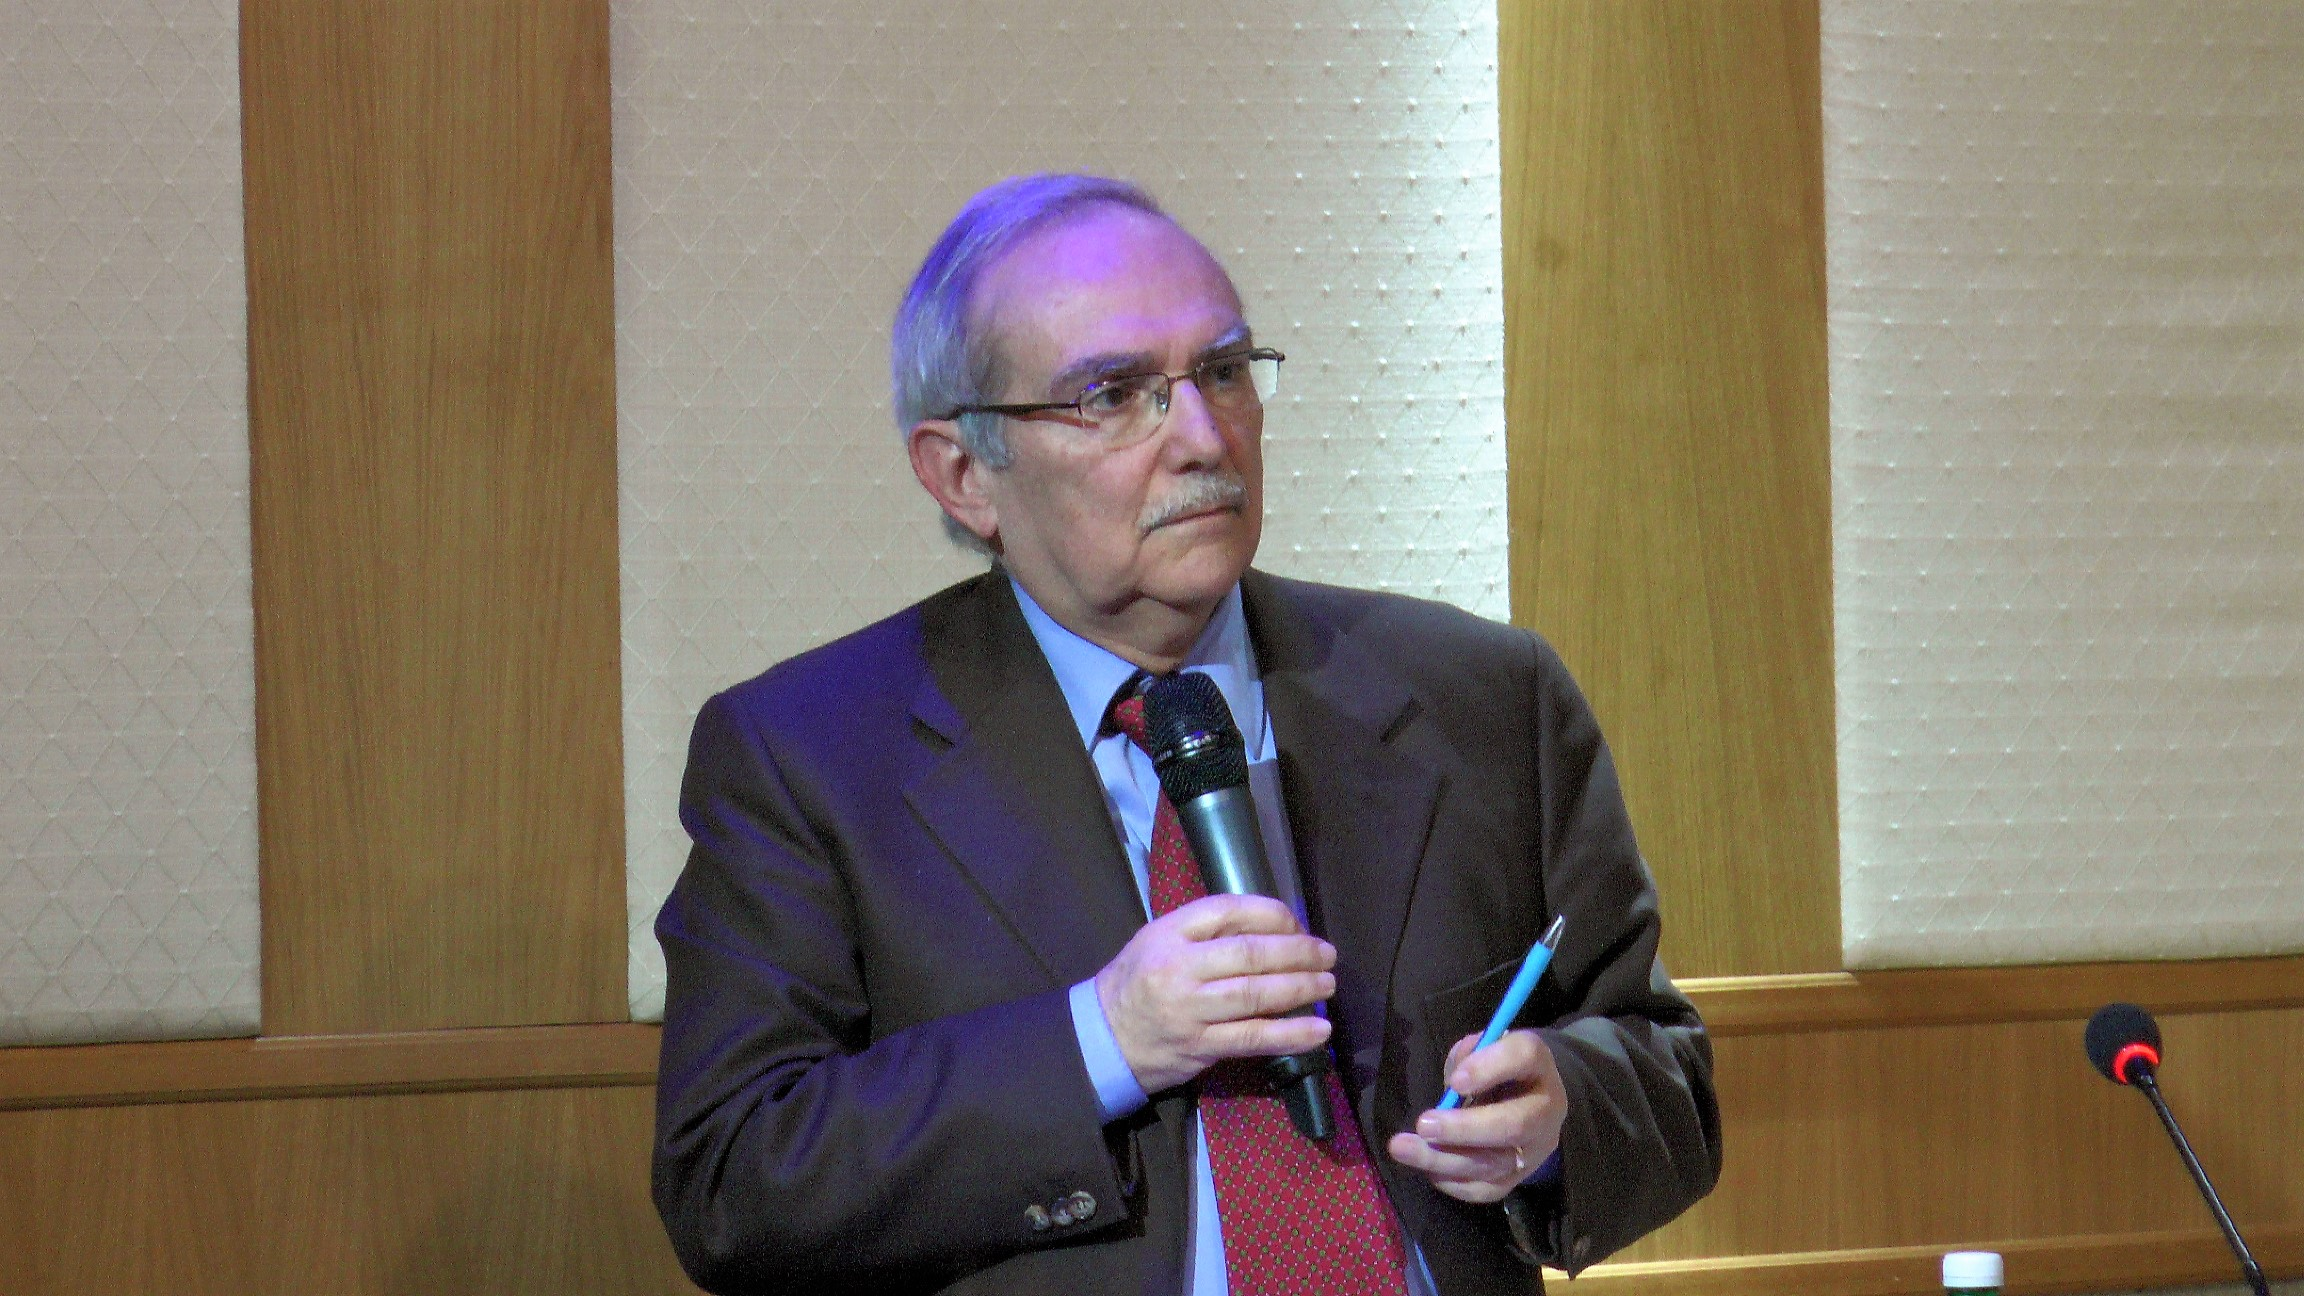 prof. Buccelli